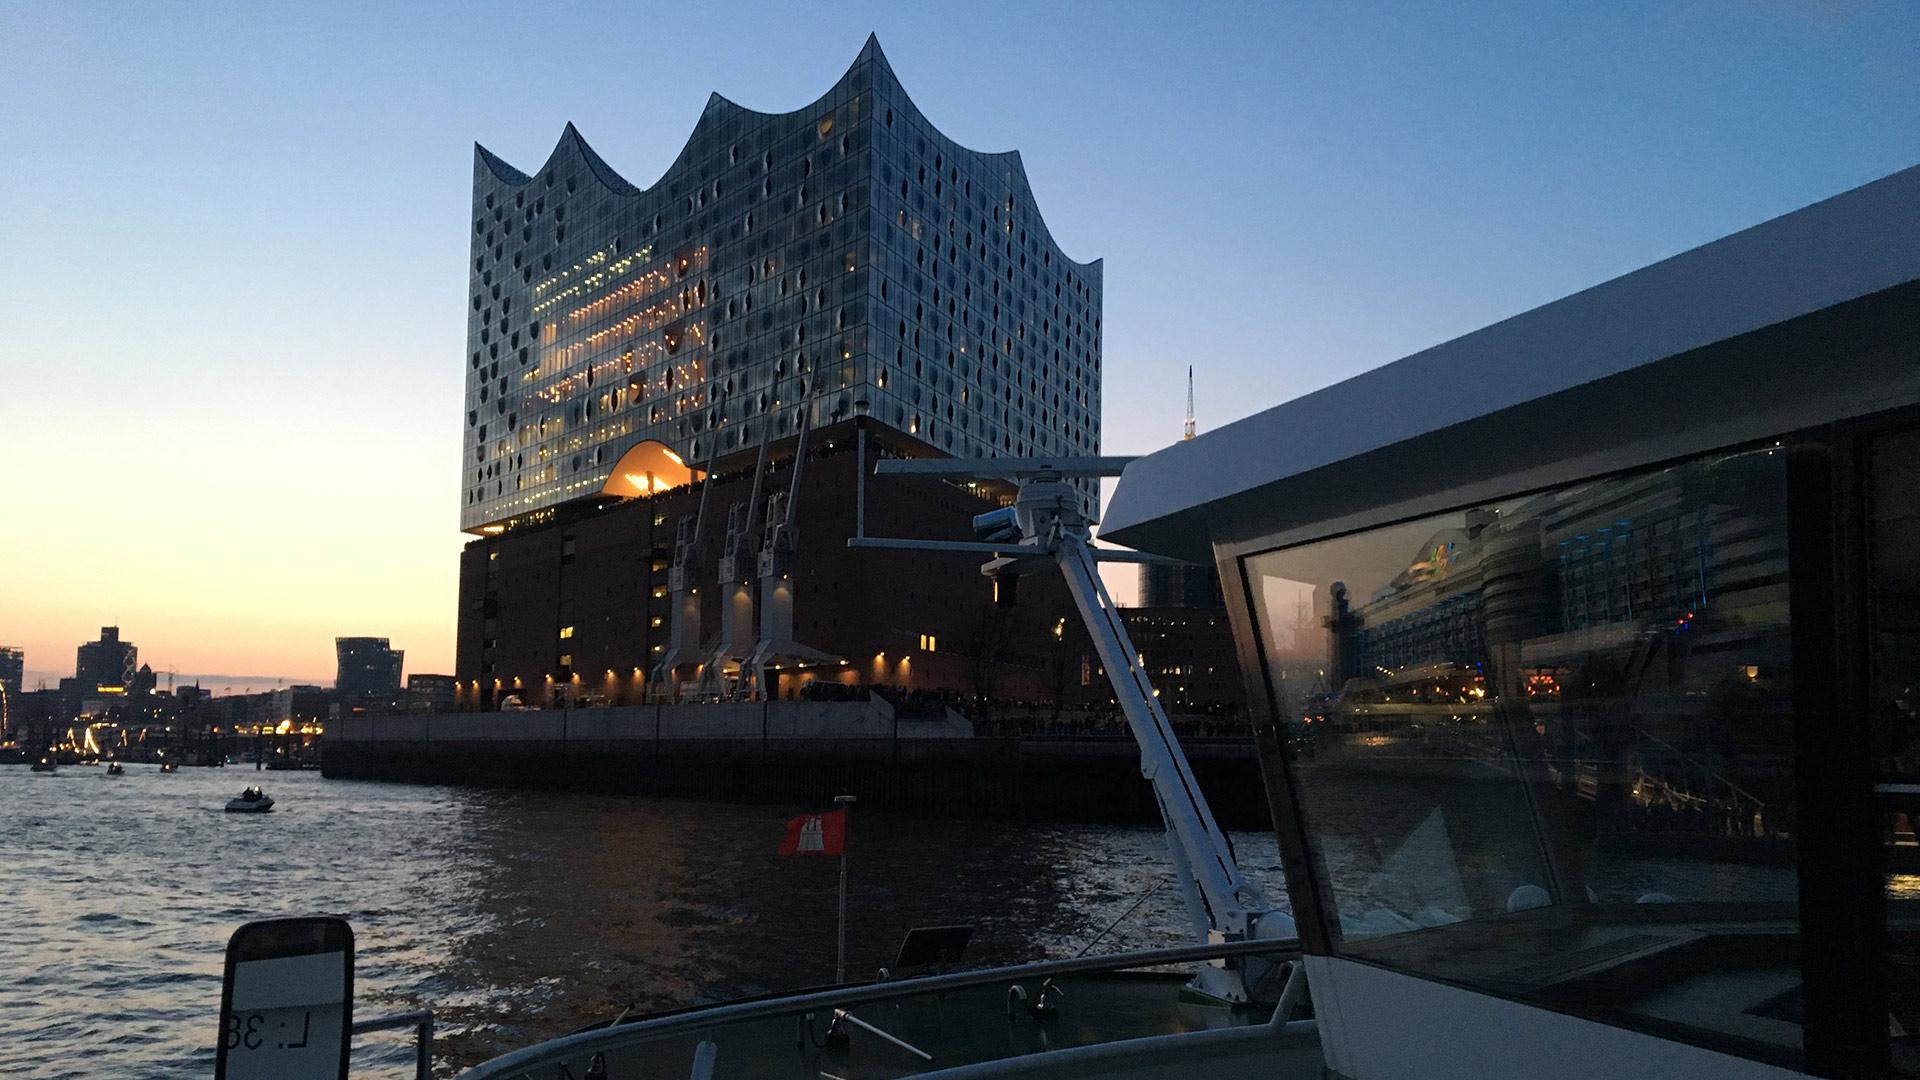 Hamburger Hafen mit Elbphilharmony